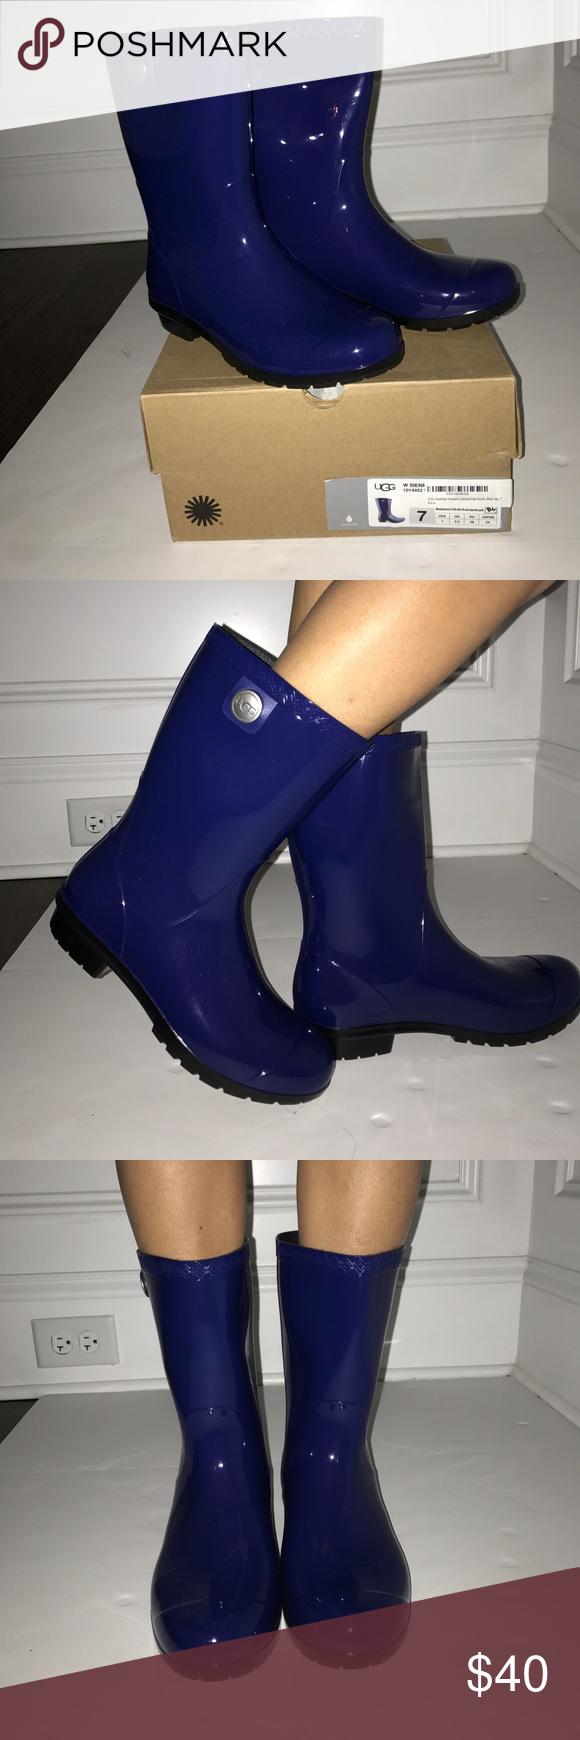 796cdf8bba5 UGG Sienna Rain Boot 100% Authentic UGG Sienna Rain Boot in the ...